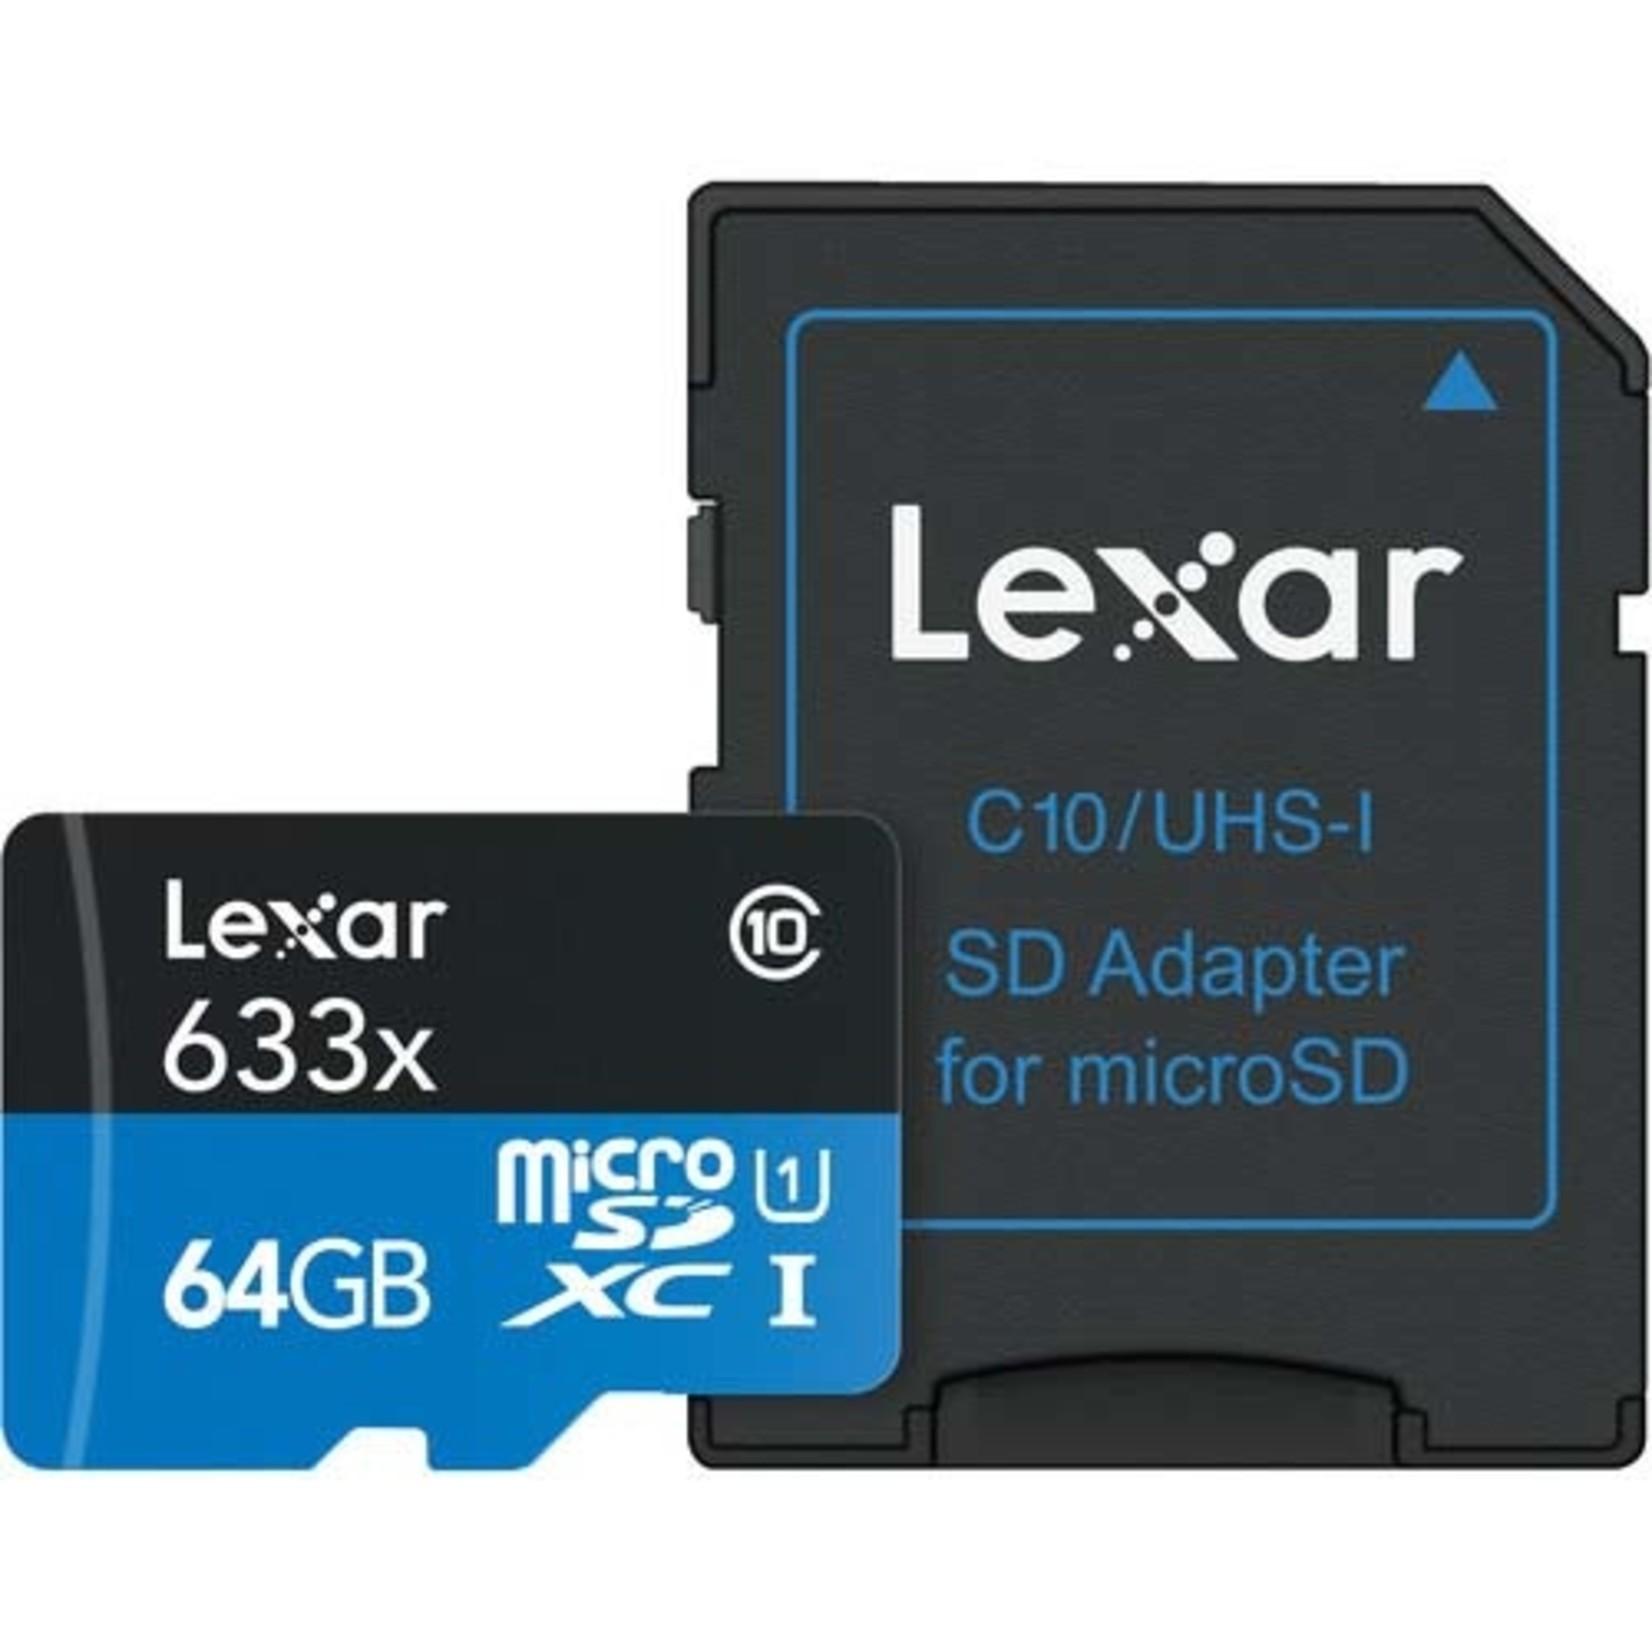 Lexar 633x UHS-I microSDXC 64GB Memory Card with SD Adapter